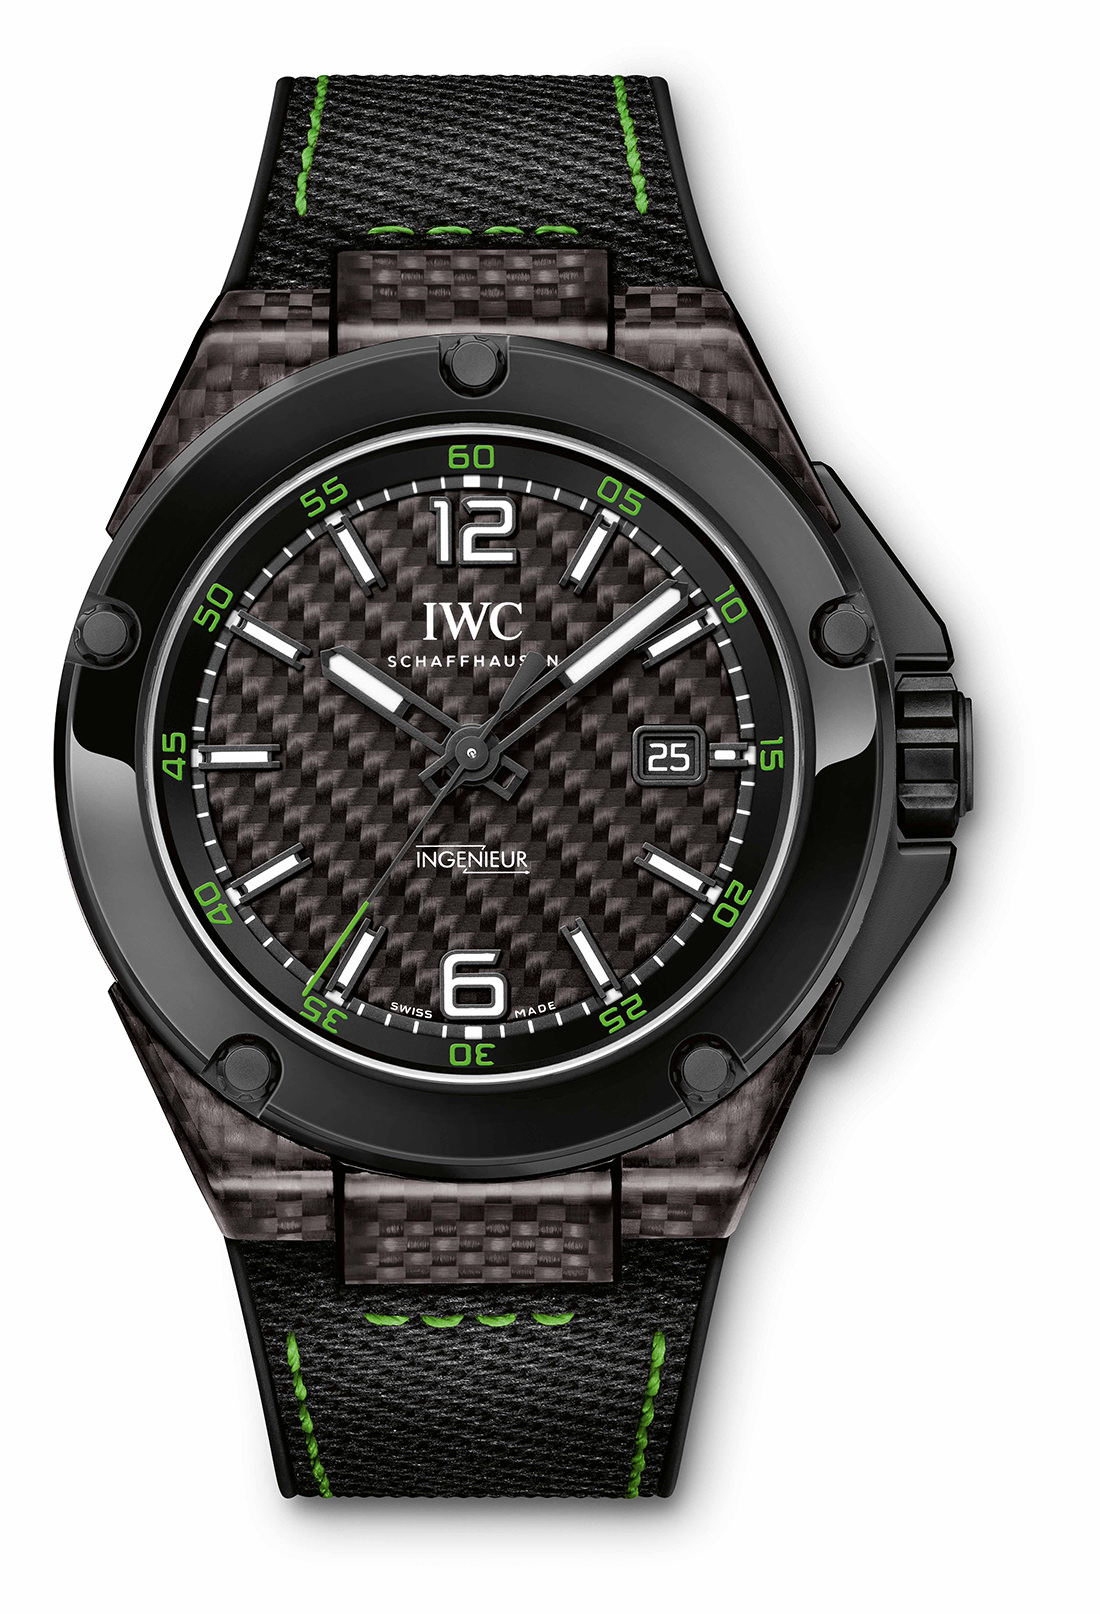 IWC-ingenieur-automatic-carbon-performance-ceramic-2